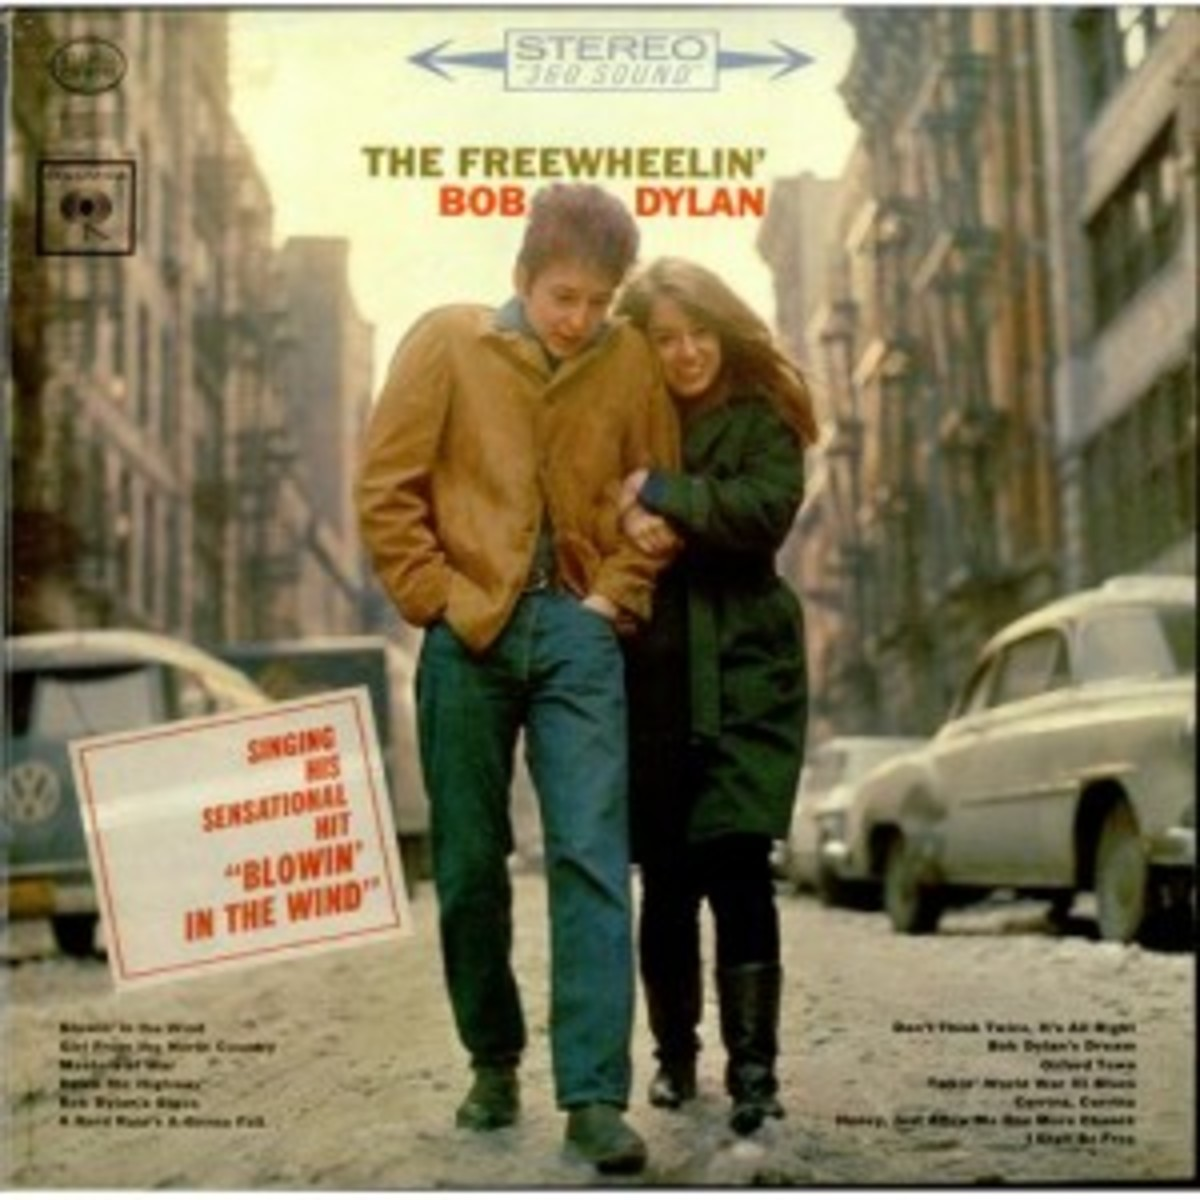 Bob-Dylan-The-Freewheelin